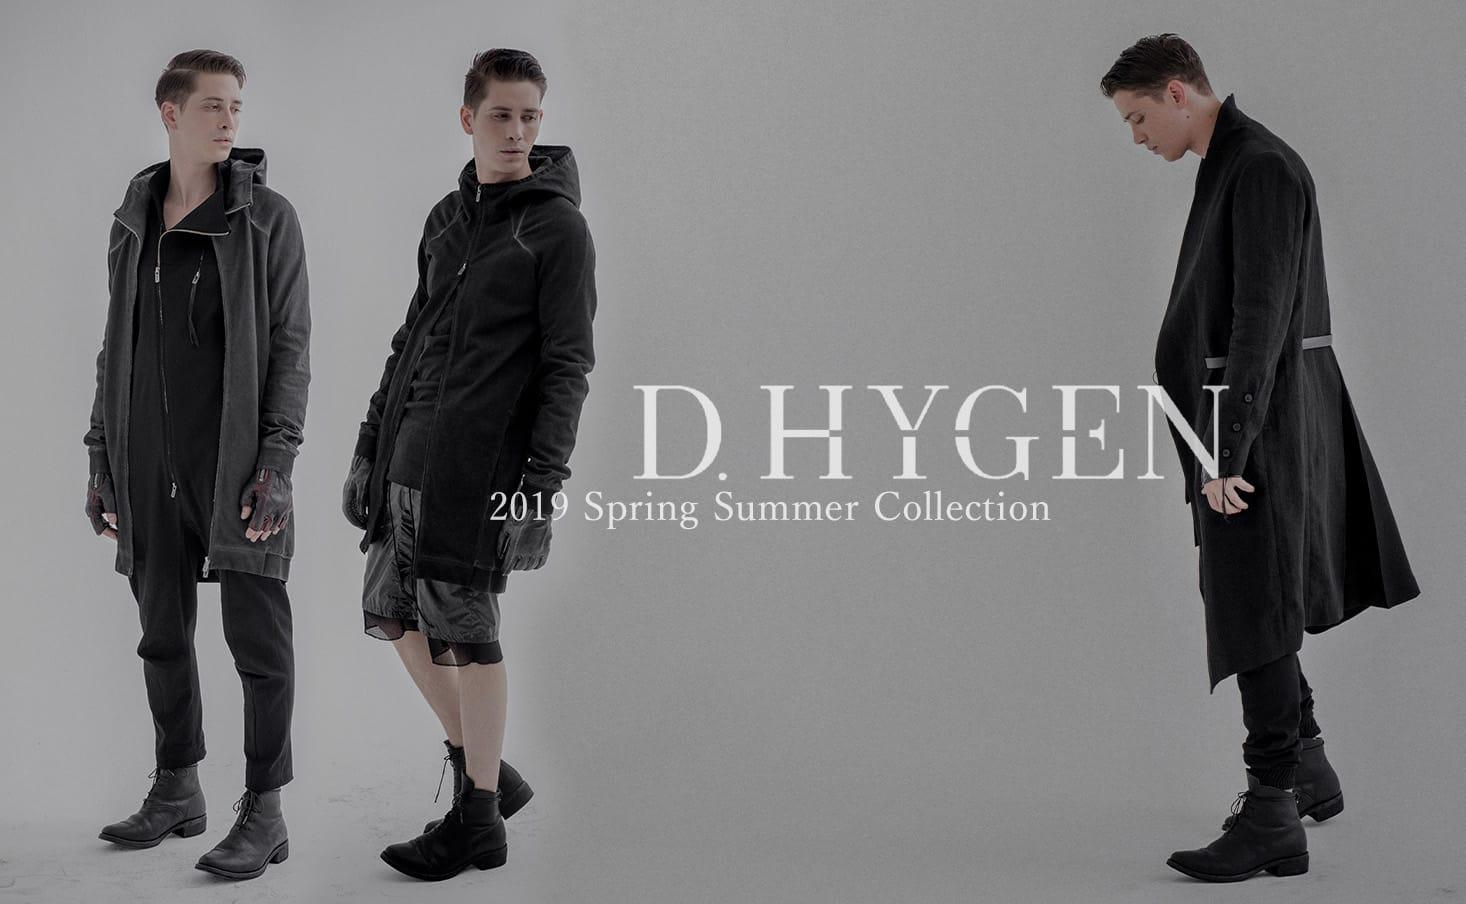 D.Hygen 2019 Spring Summer Collection